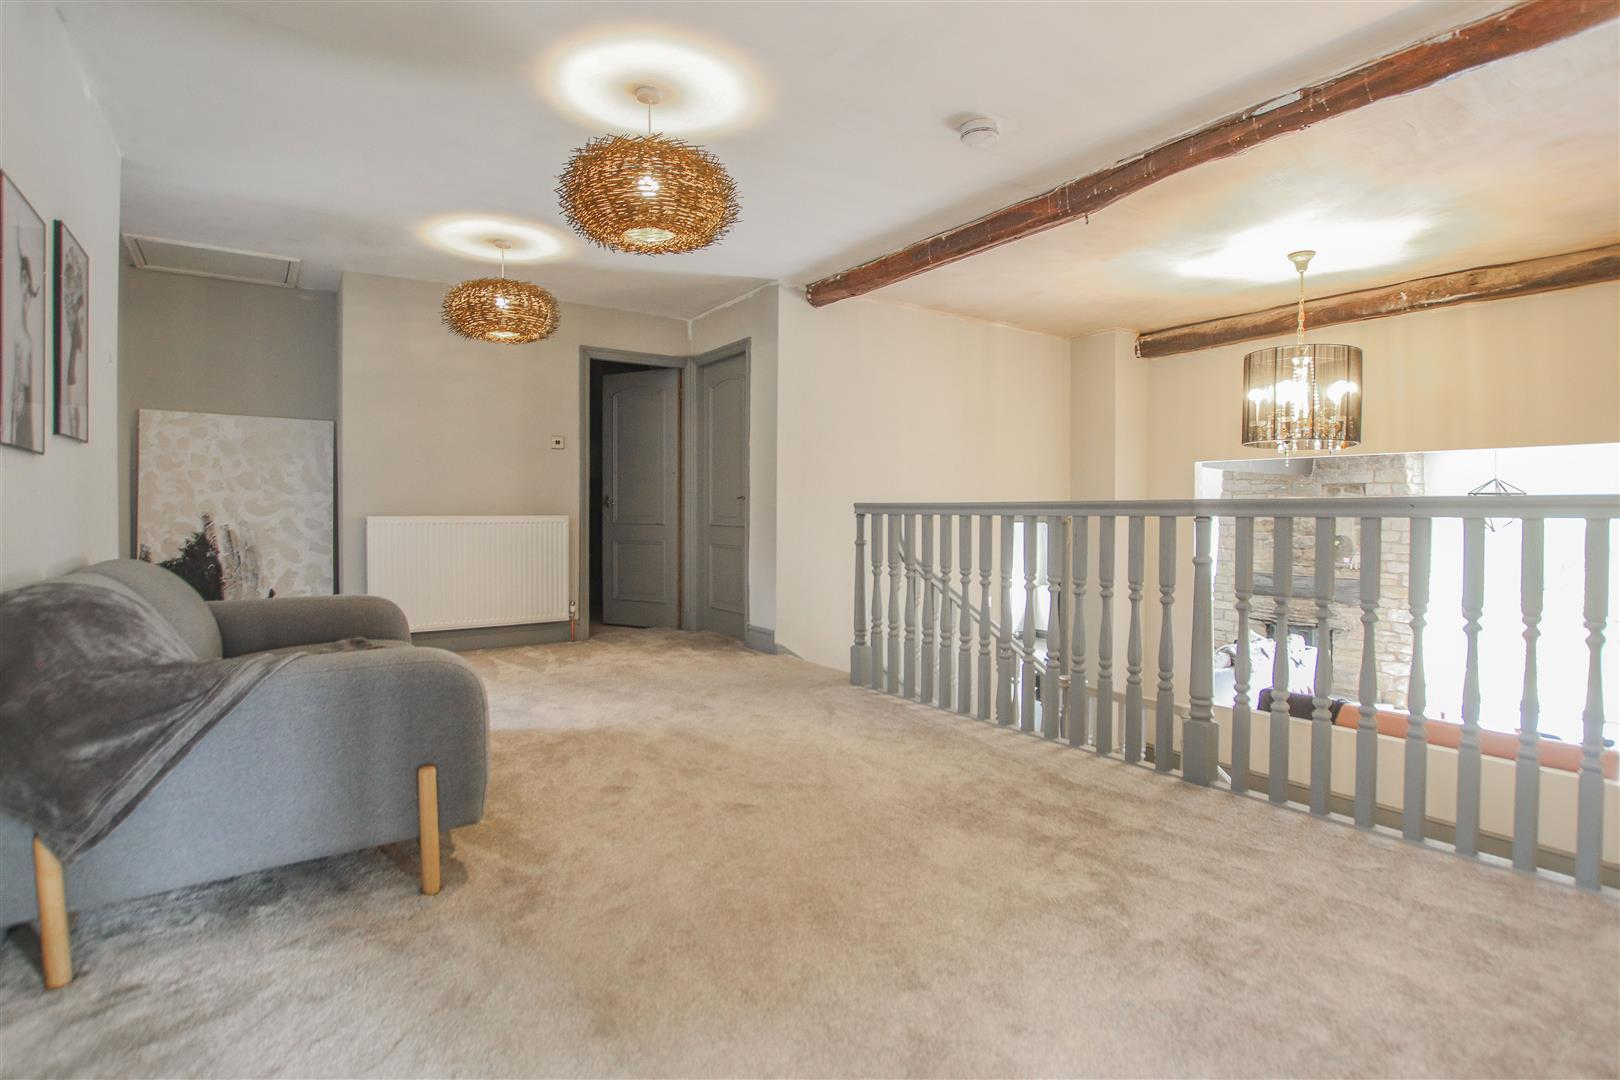 6 Bedroom Barn Conversion For Sale - 9.JPG